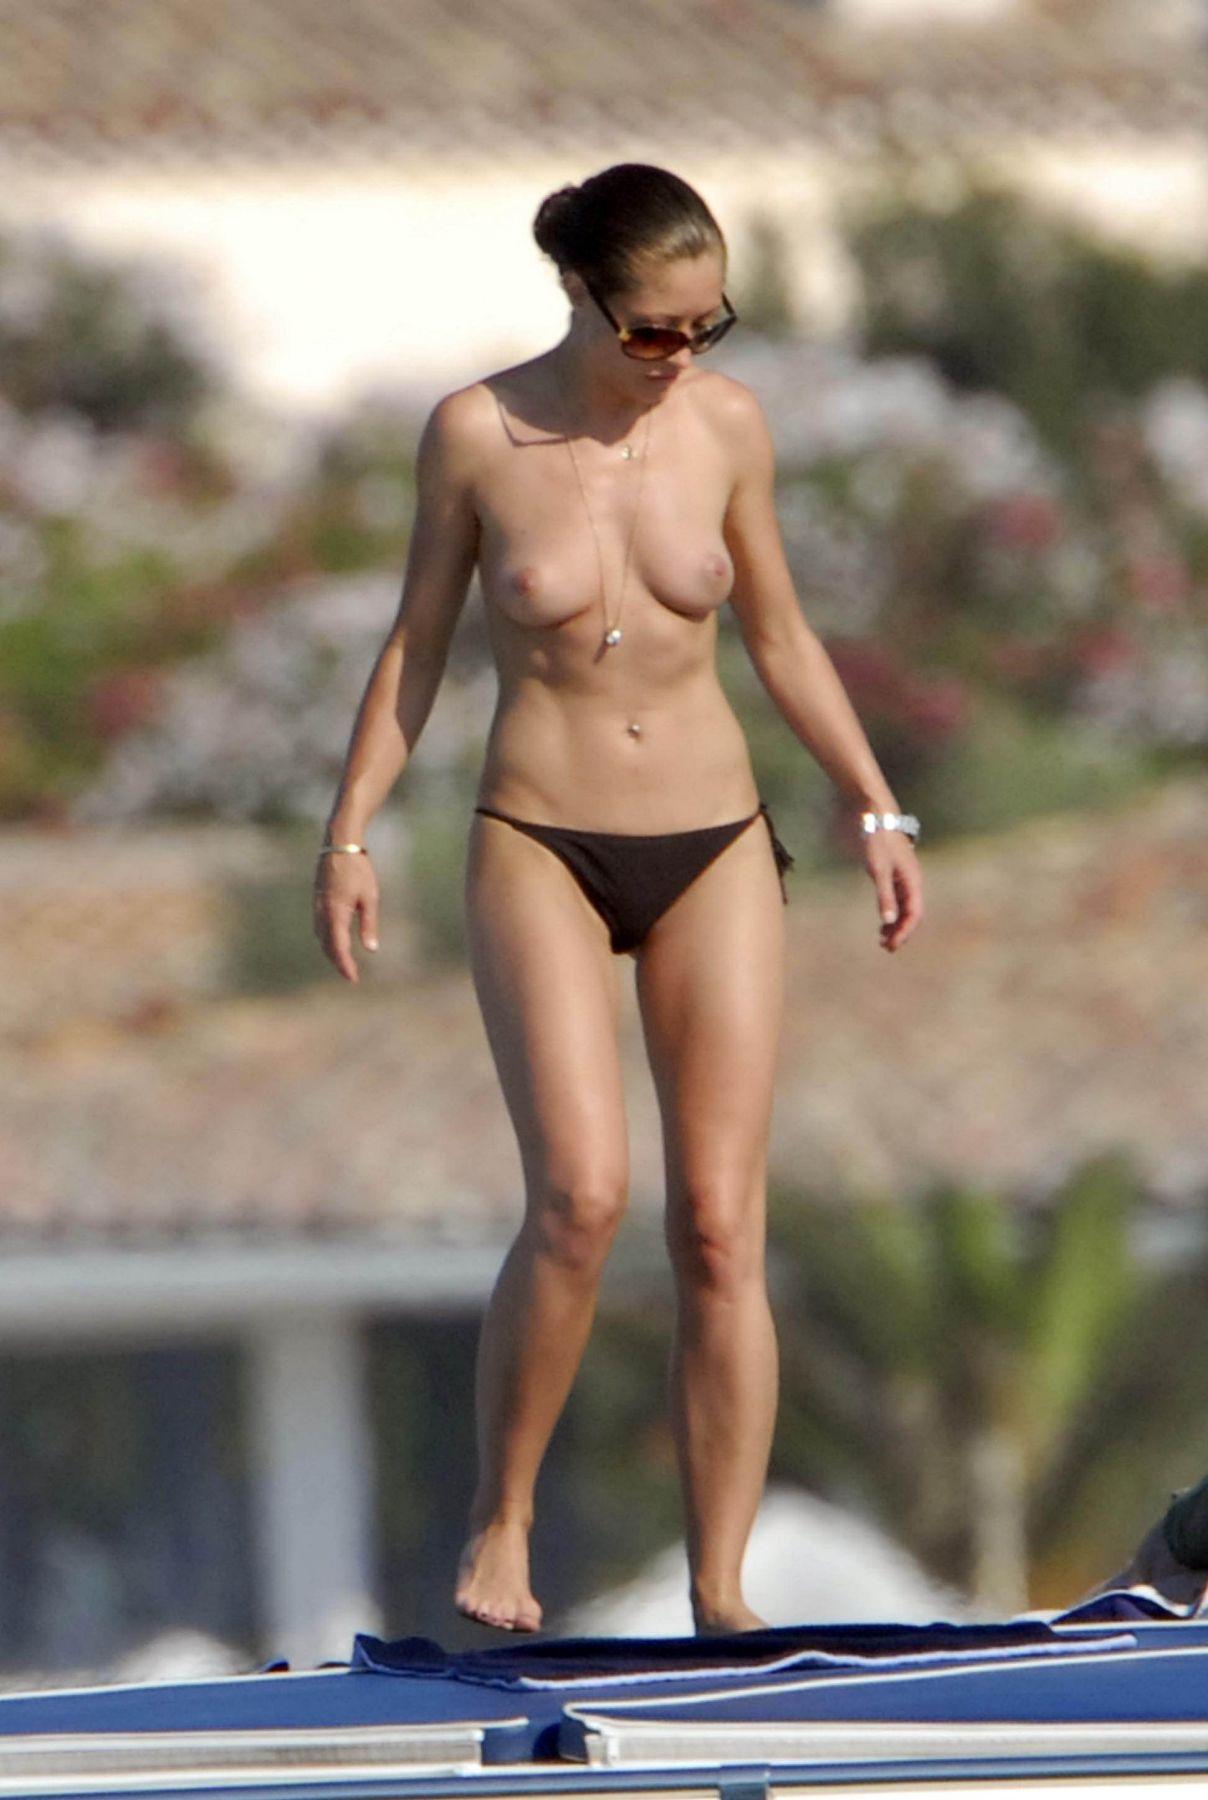 Men who wear bikini swimwear